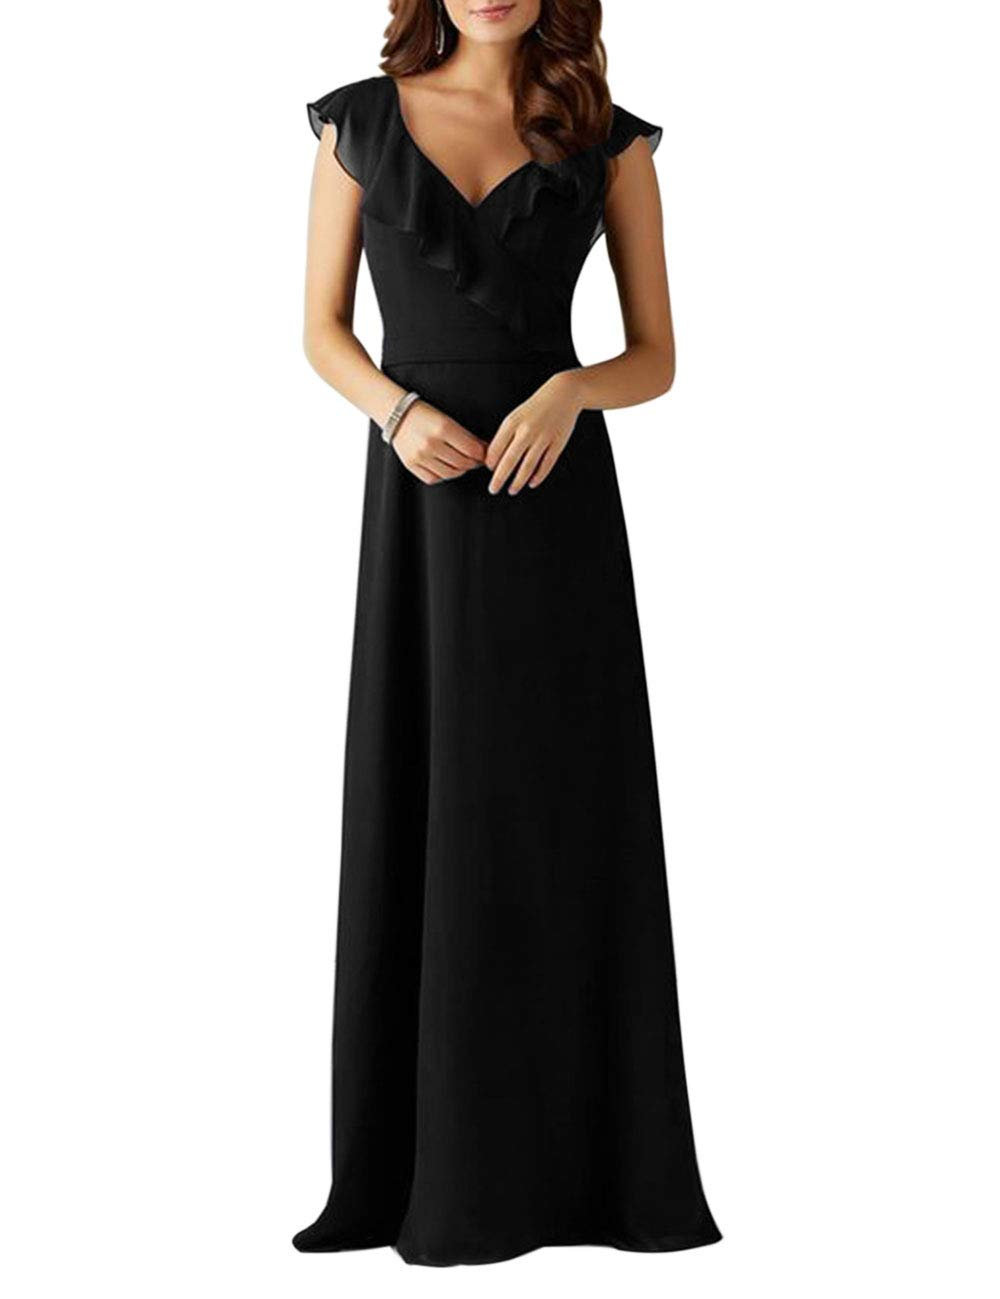 FASHIONMIA Women's Ruffle Chiffon Sleeveless Maxi Dress Summer Vintage Wedding Party Dresses